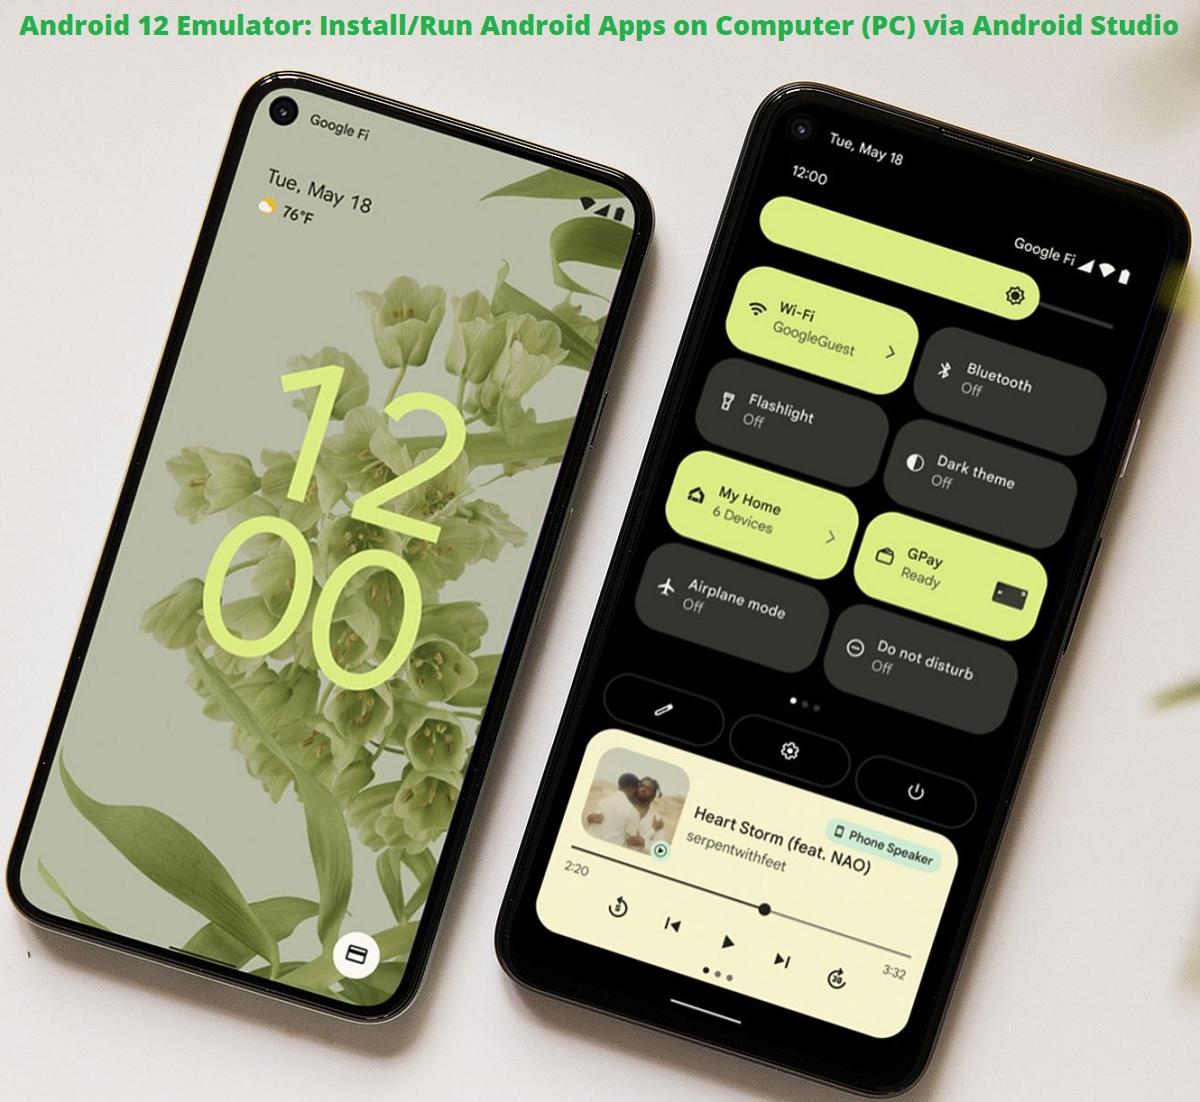 Android 12 Emulator